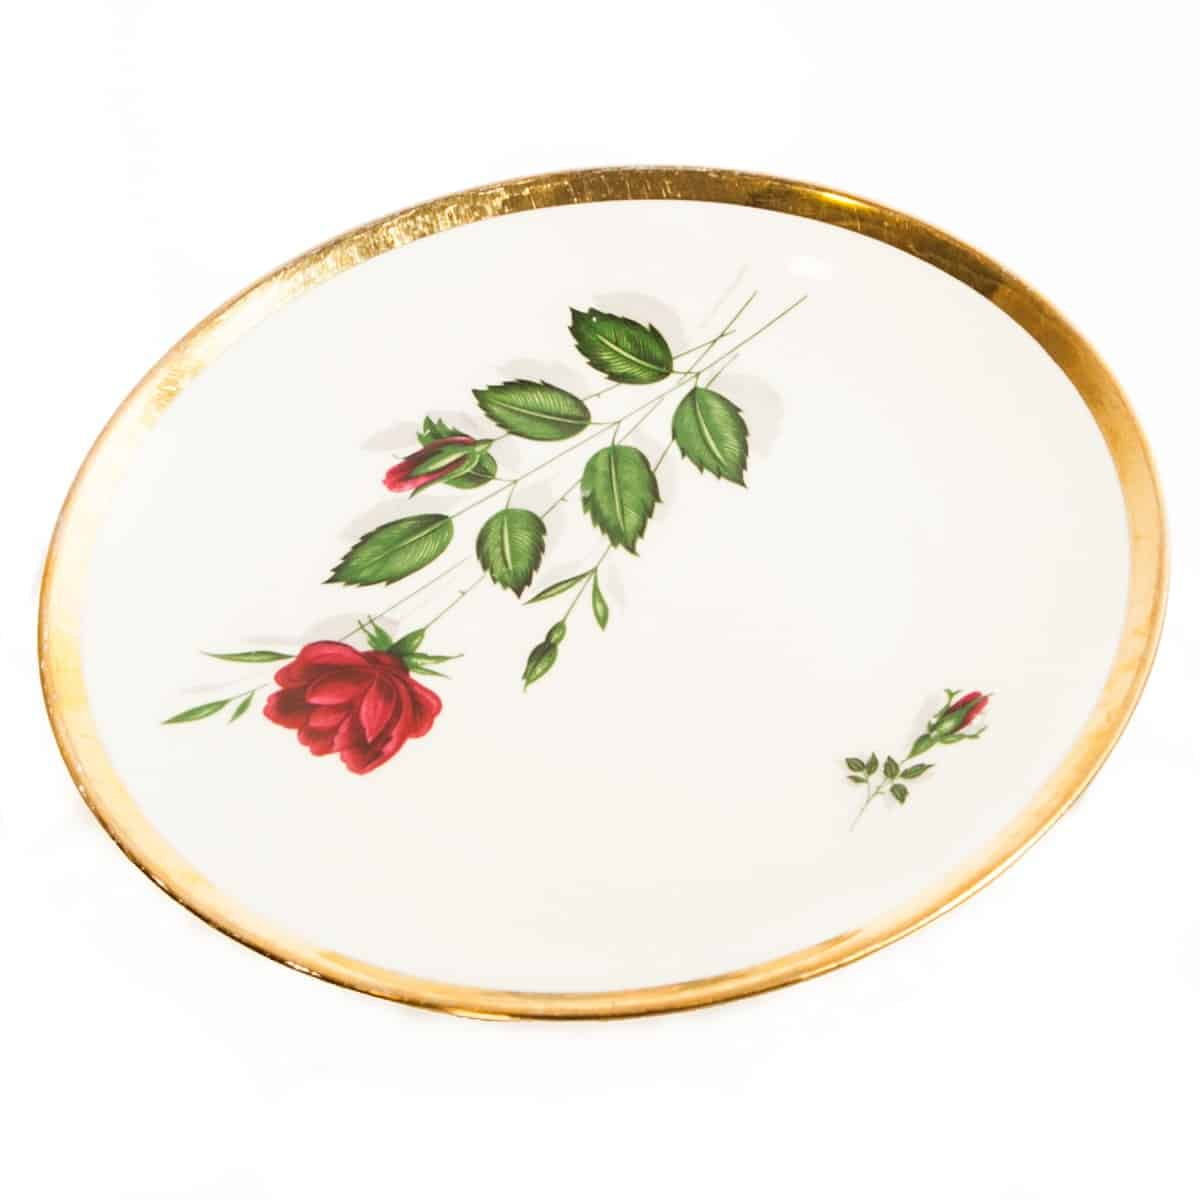 Тарелка с розой